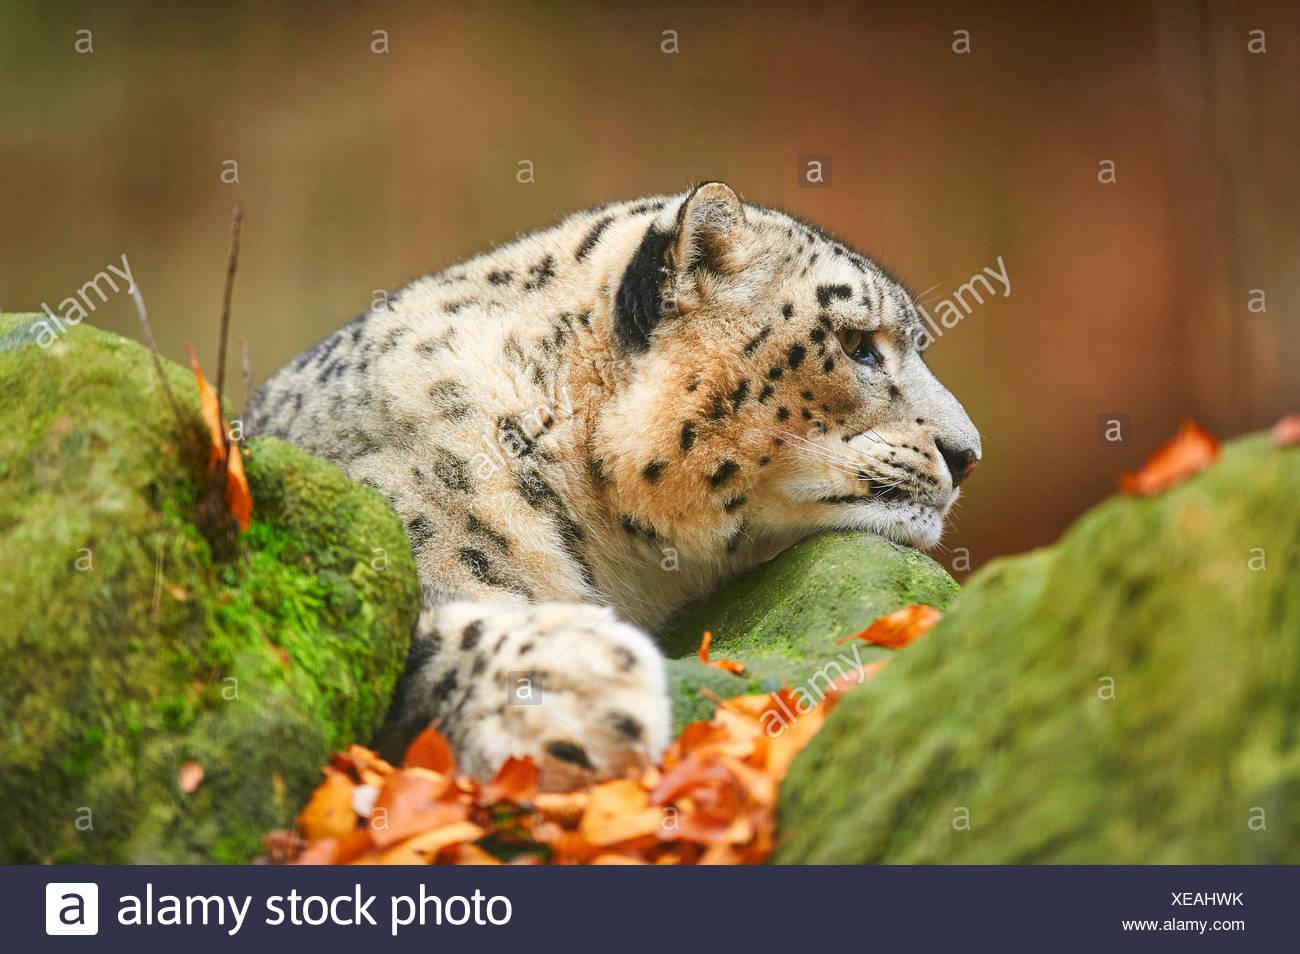 snow leopard (Uncia uncia, Panthera uncia), snow leopardess resting on a mossy boulder, portrait - Stock Image